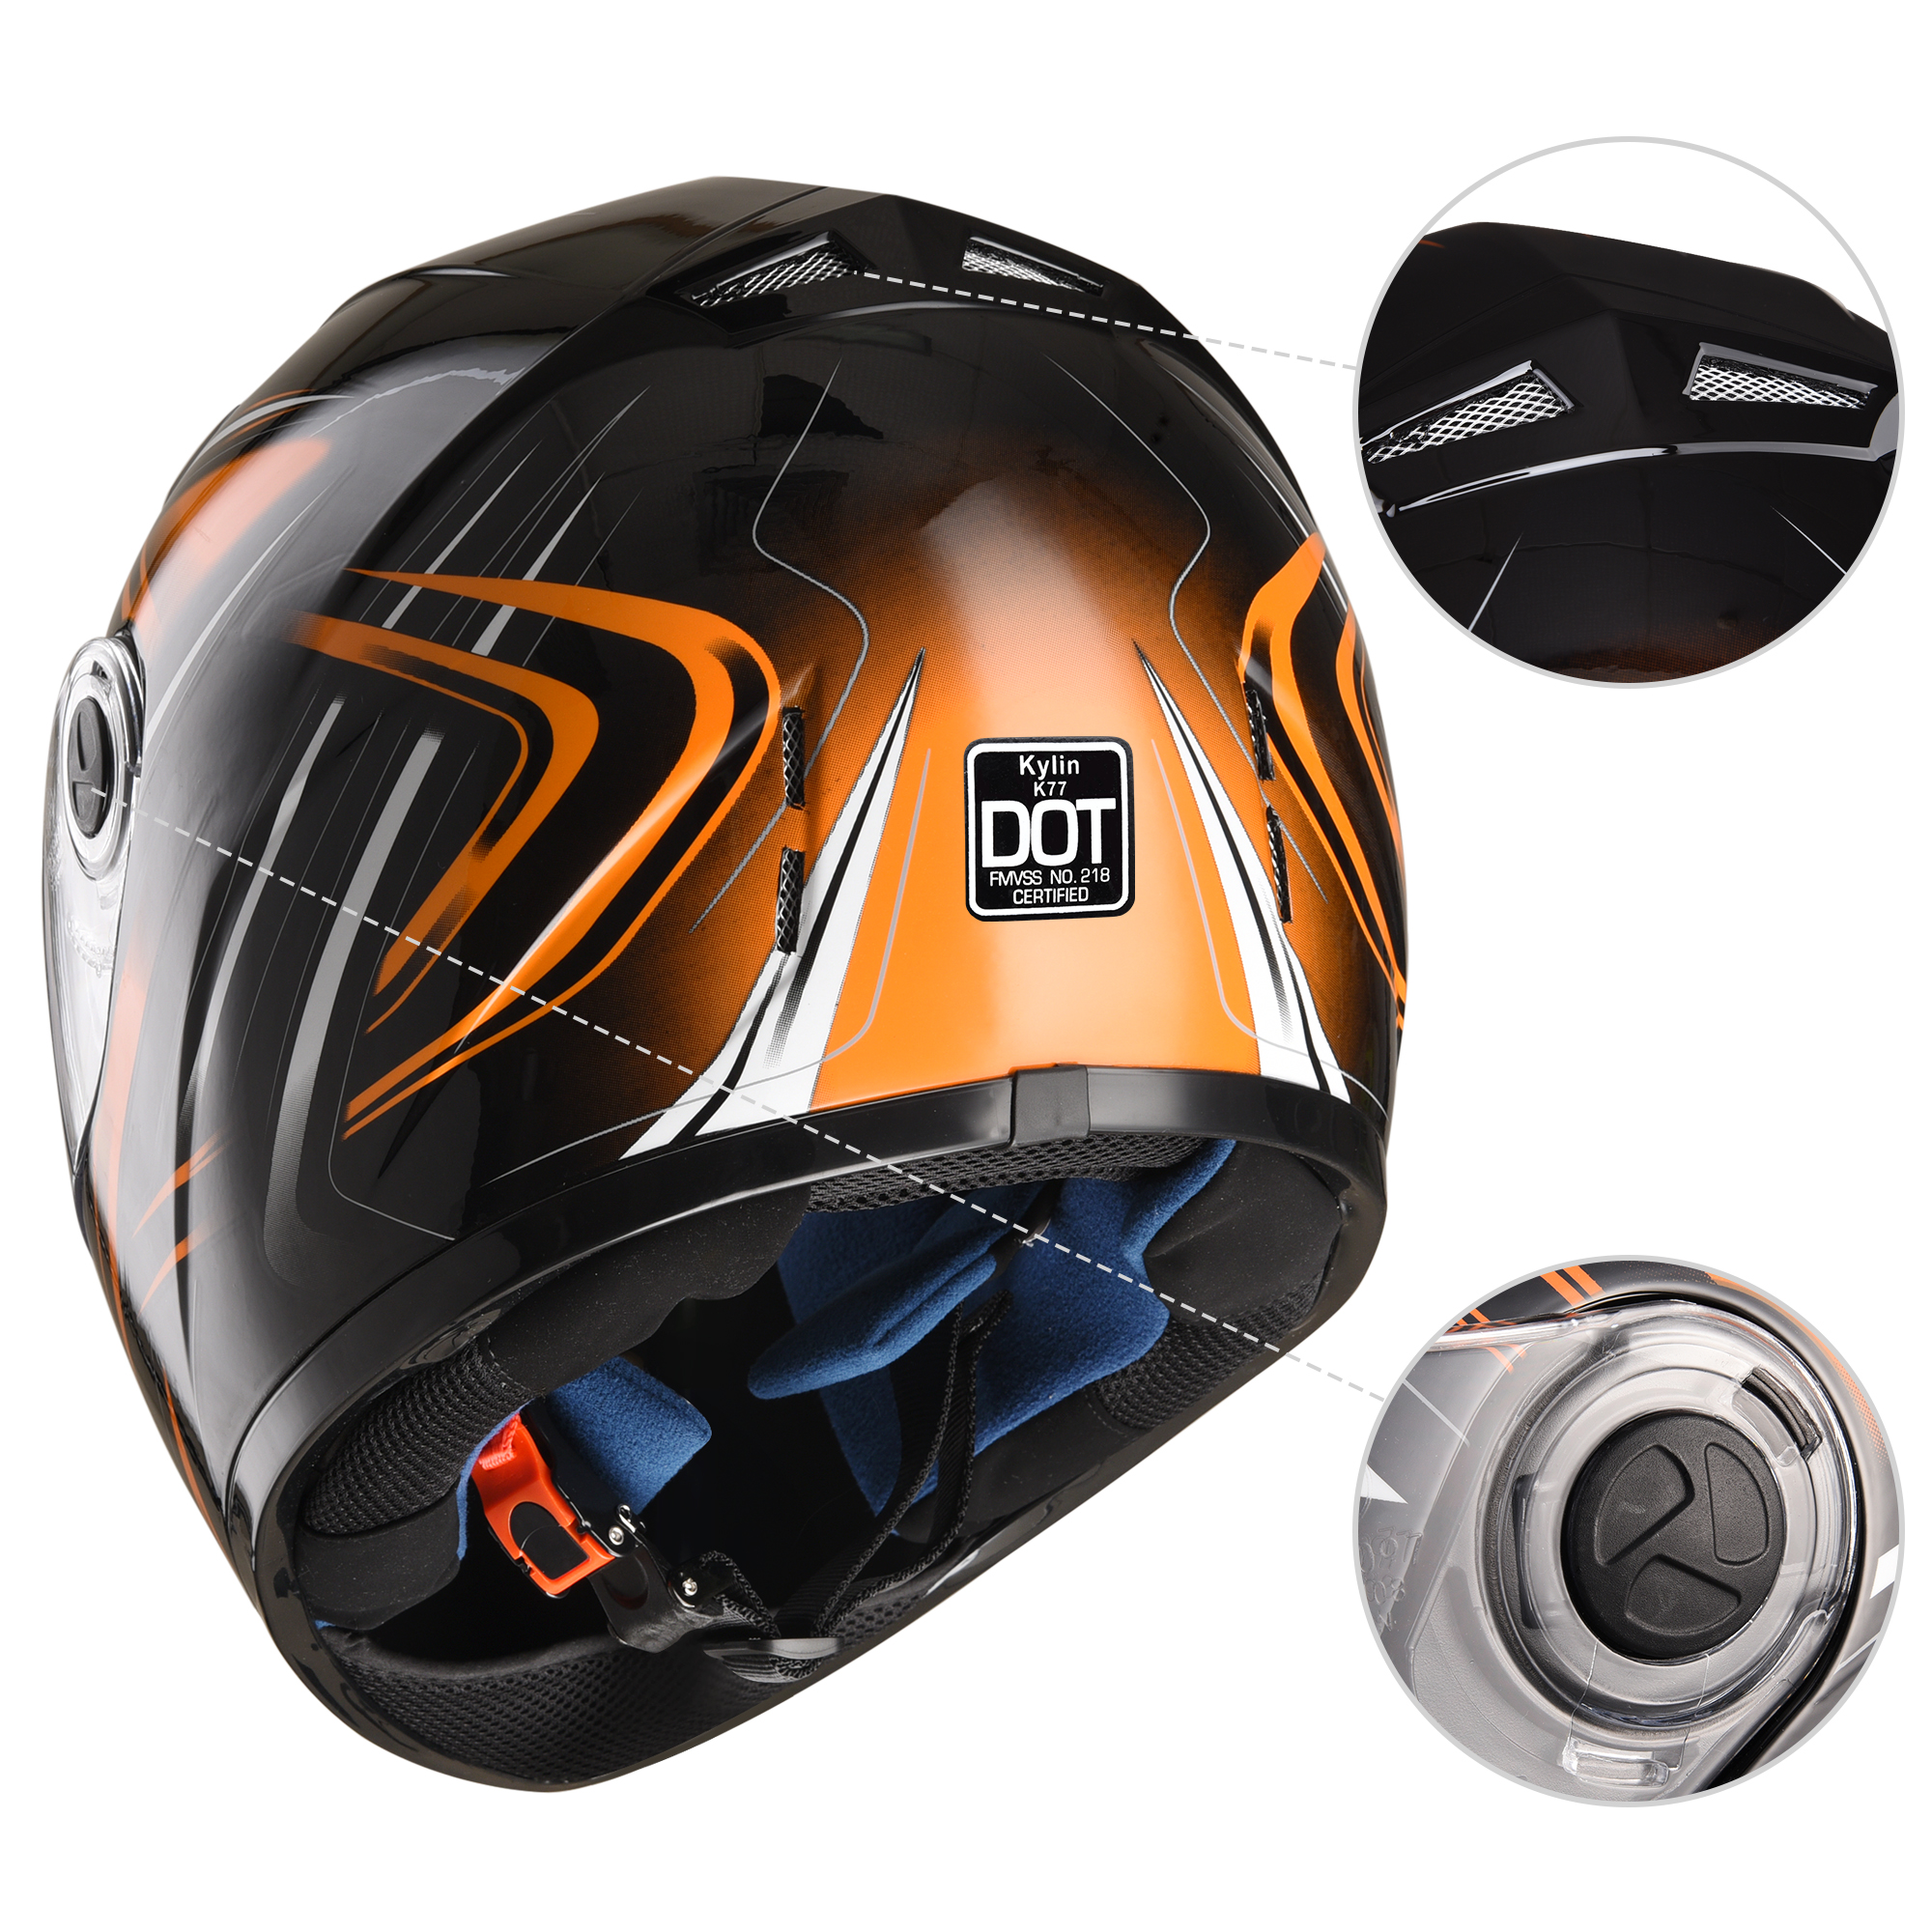 miniature 76 - AHR K12 Full Face Motorcycle Helmet DOT Air Vents Clear Visor Racing S M L XL